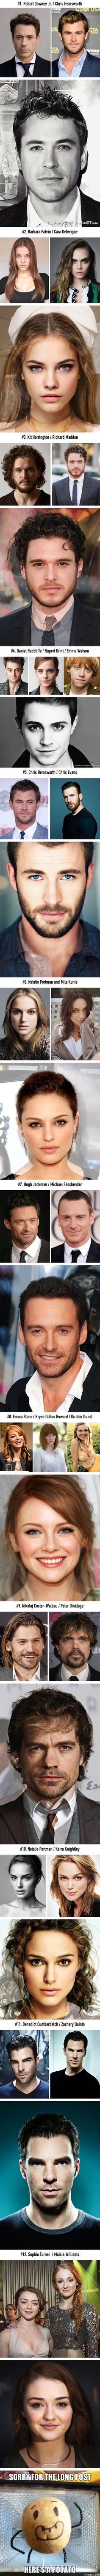 Celebrity Face Mashups (By ThatNordicGuy) celebridades combinación de caras